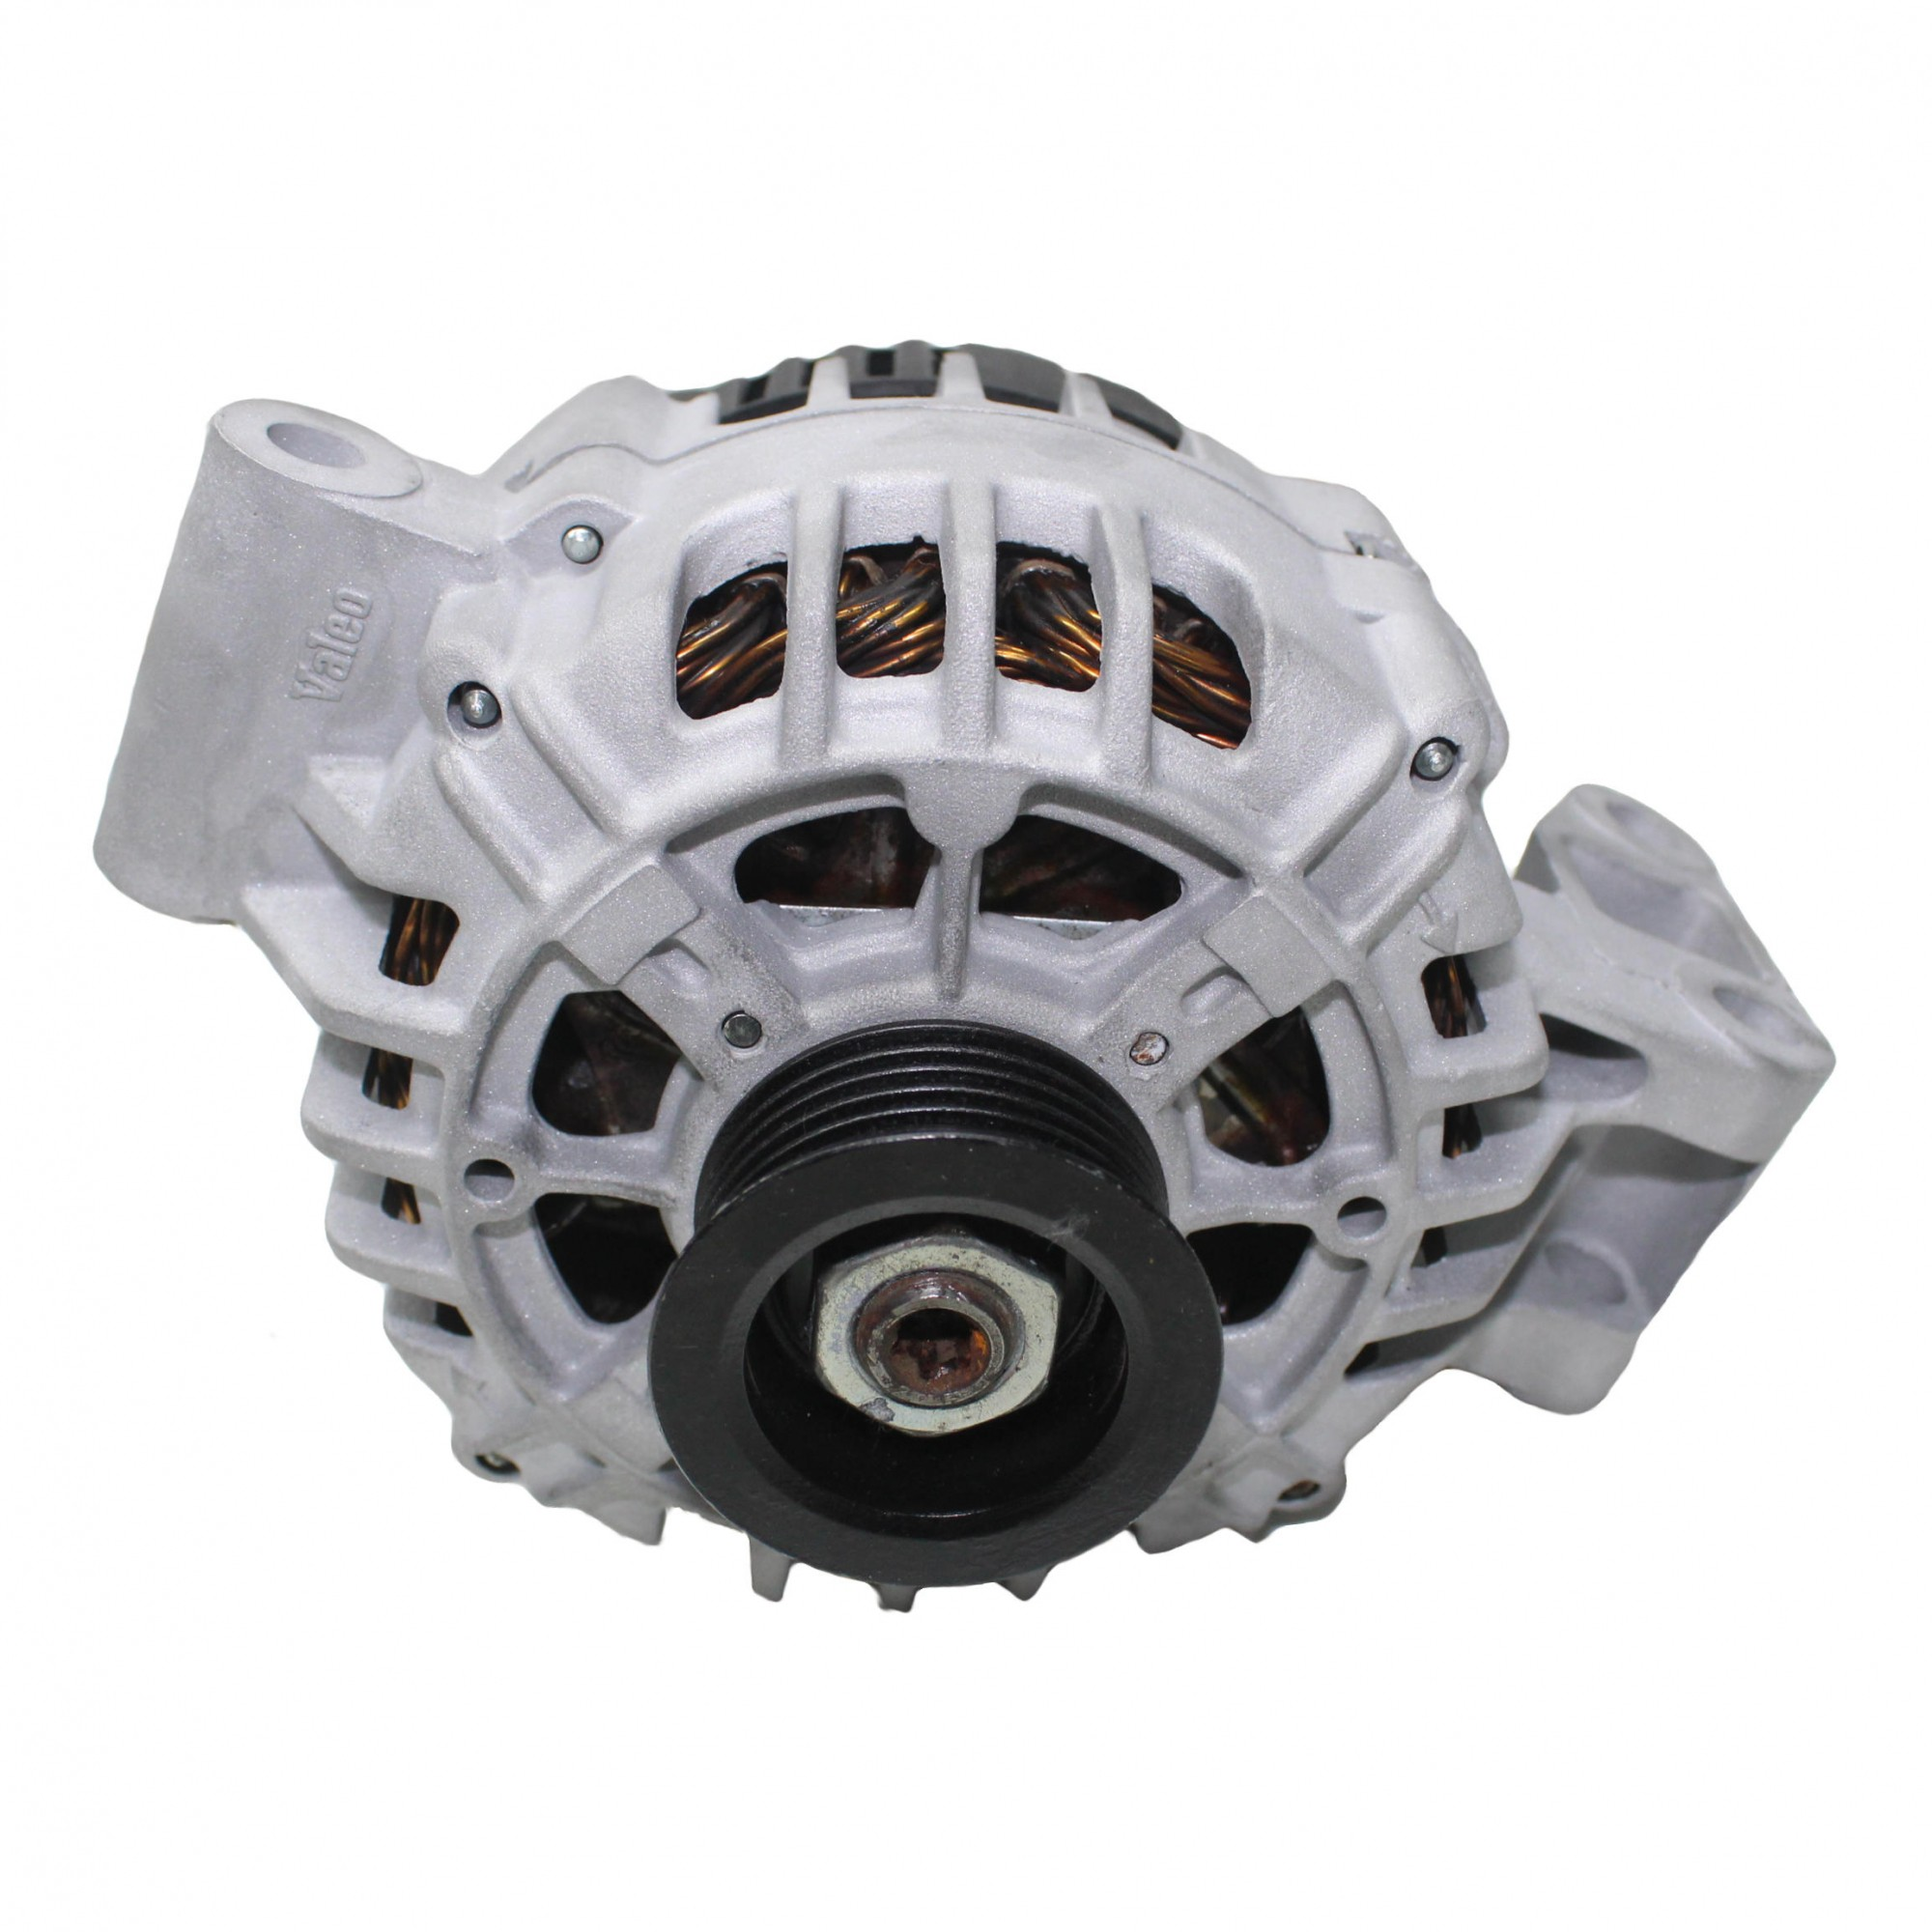 Alternador Valeo 90AH Ka, Fiesta, Ecosport 3S6510300AA/SG9B092 (Motor Rocam)